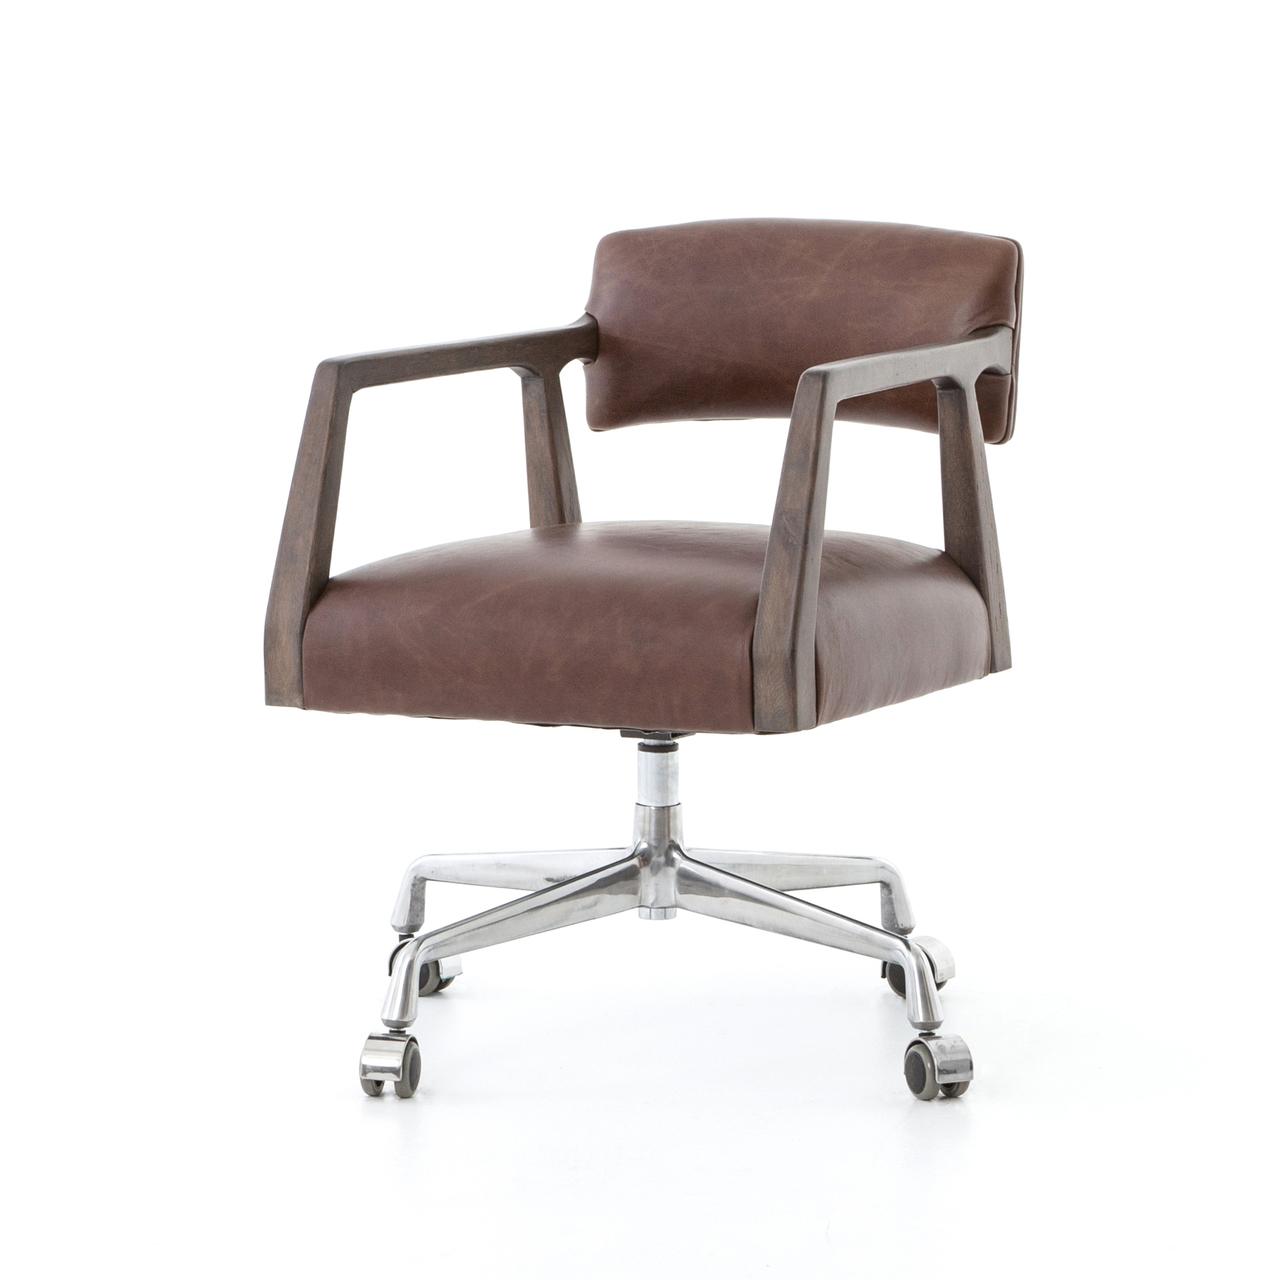 Tyler Mid Century Modern Brown Leather Office Desk Chair Zin Home